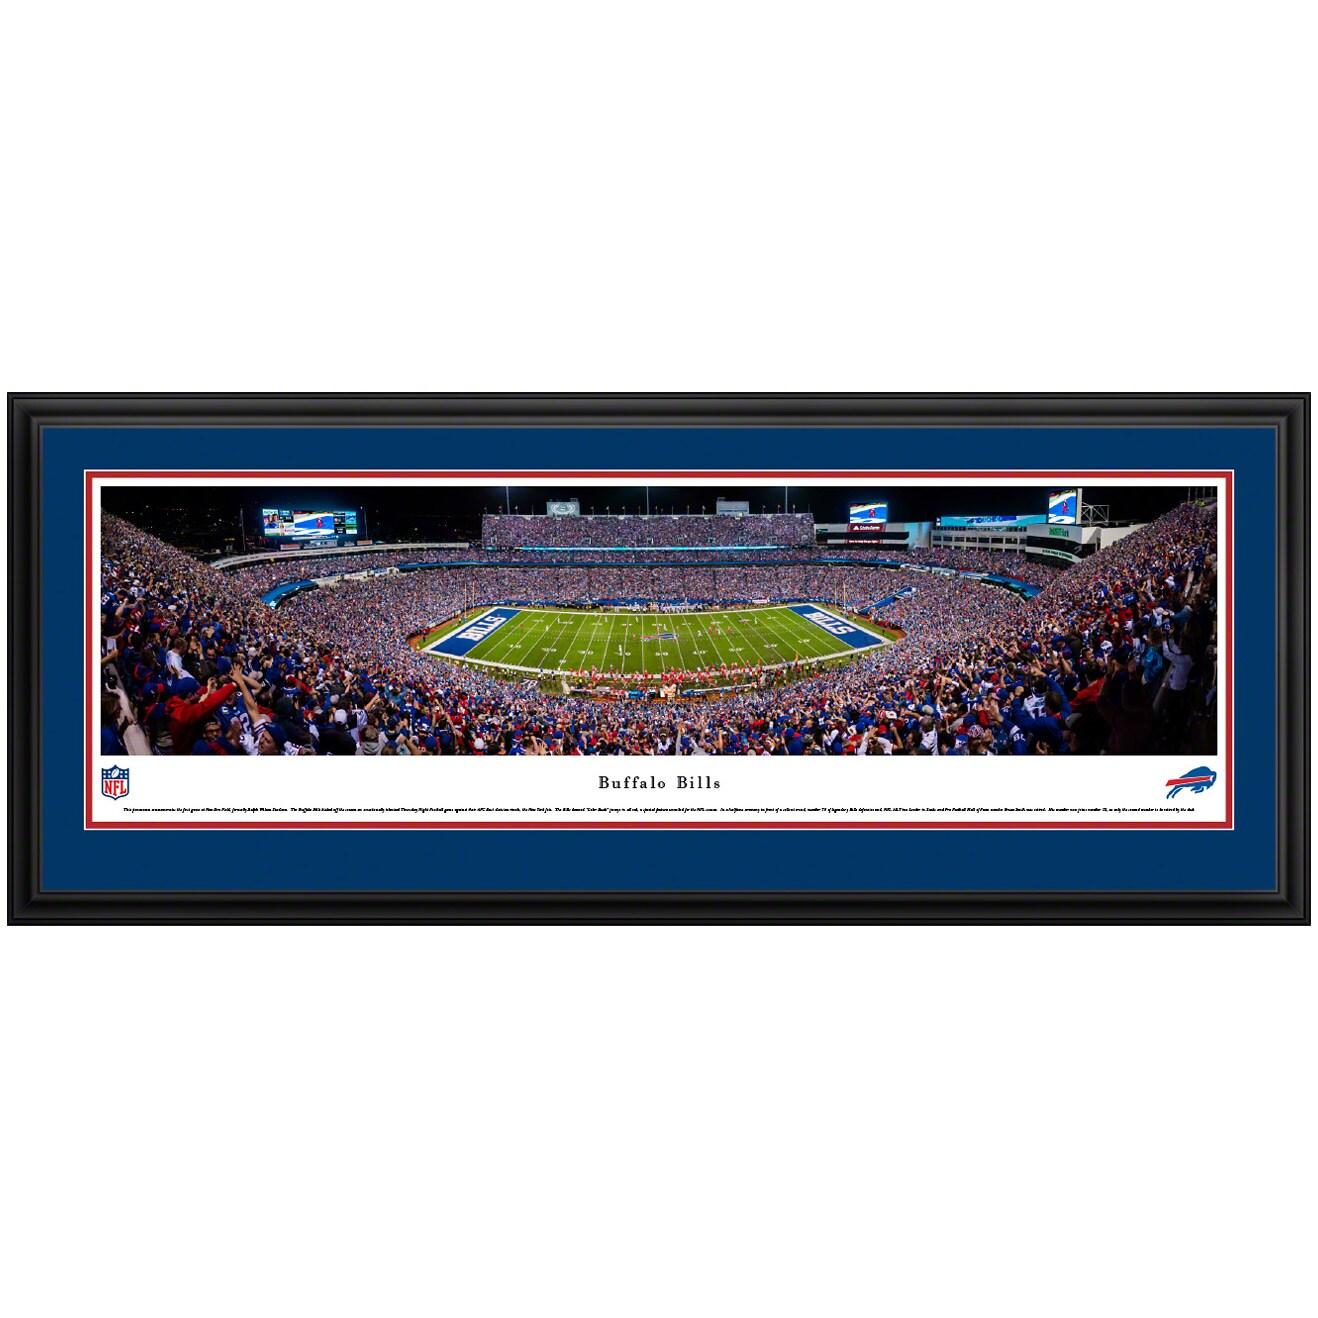 "Buffalo Bills 44"" x 18"" Deluxe Frame Panoramic Photo"